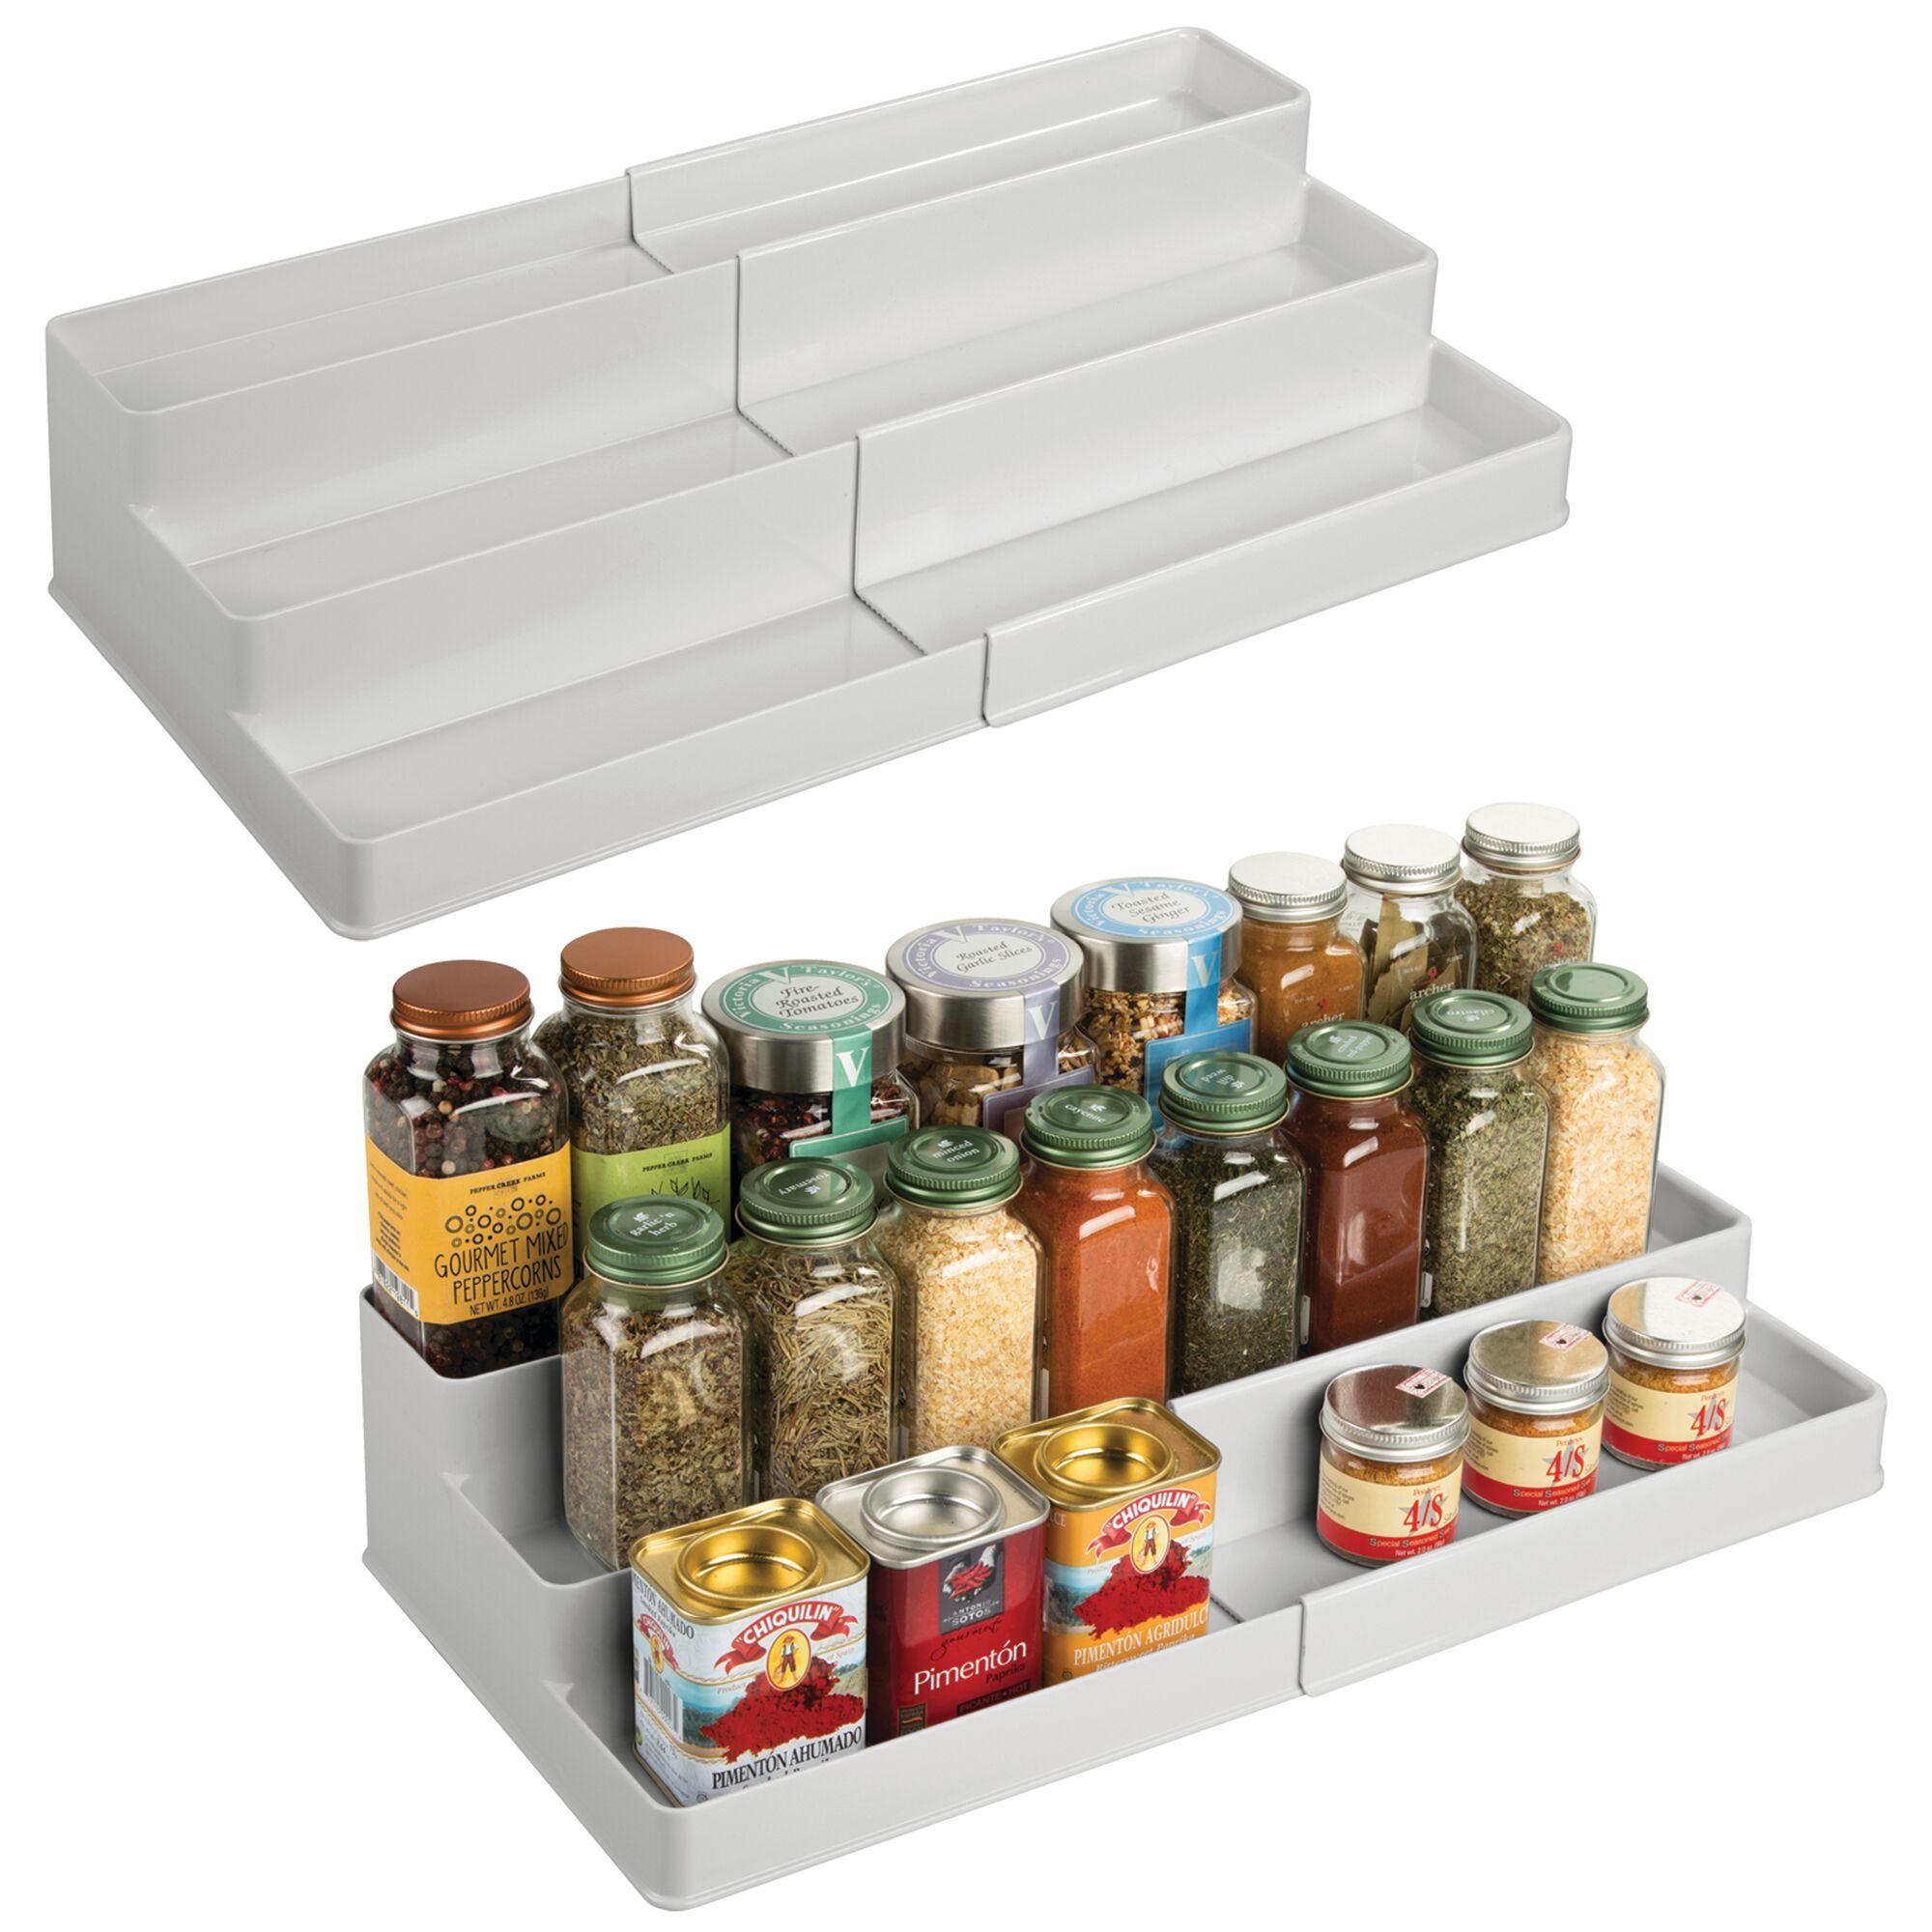 mDesign-Expandable-Kitchen-Cabinet-Pantry-Organizer-Spice-Rack thumbnail 47